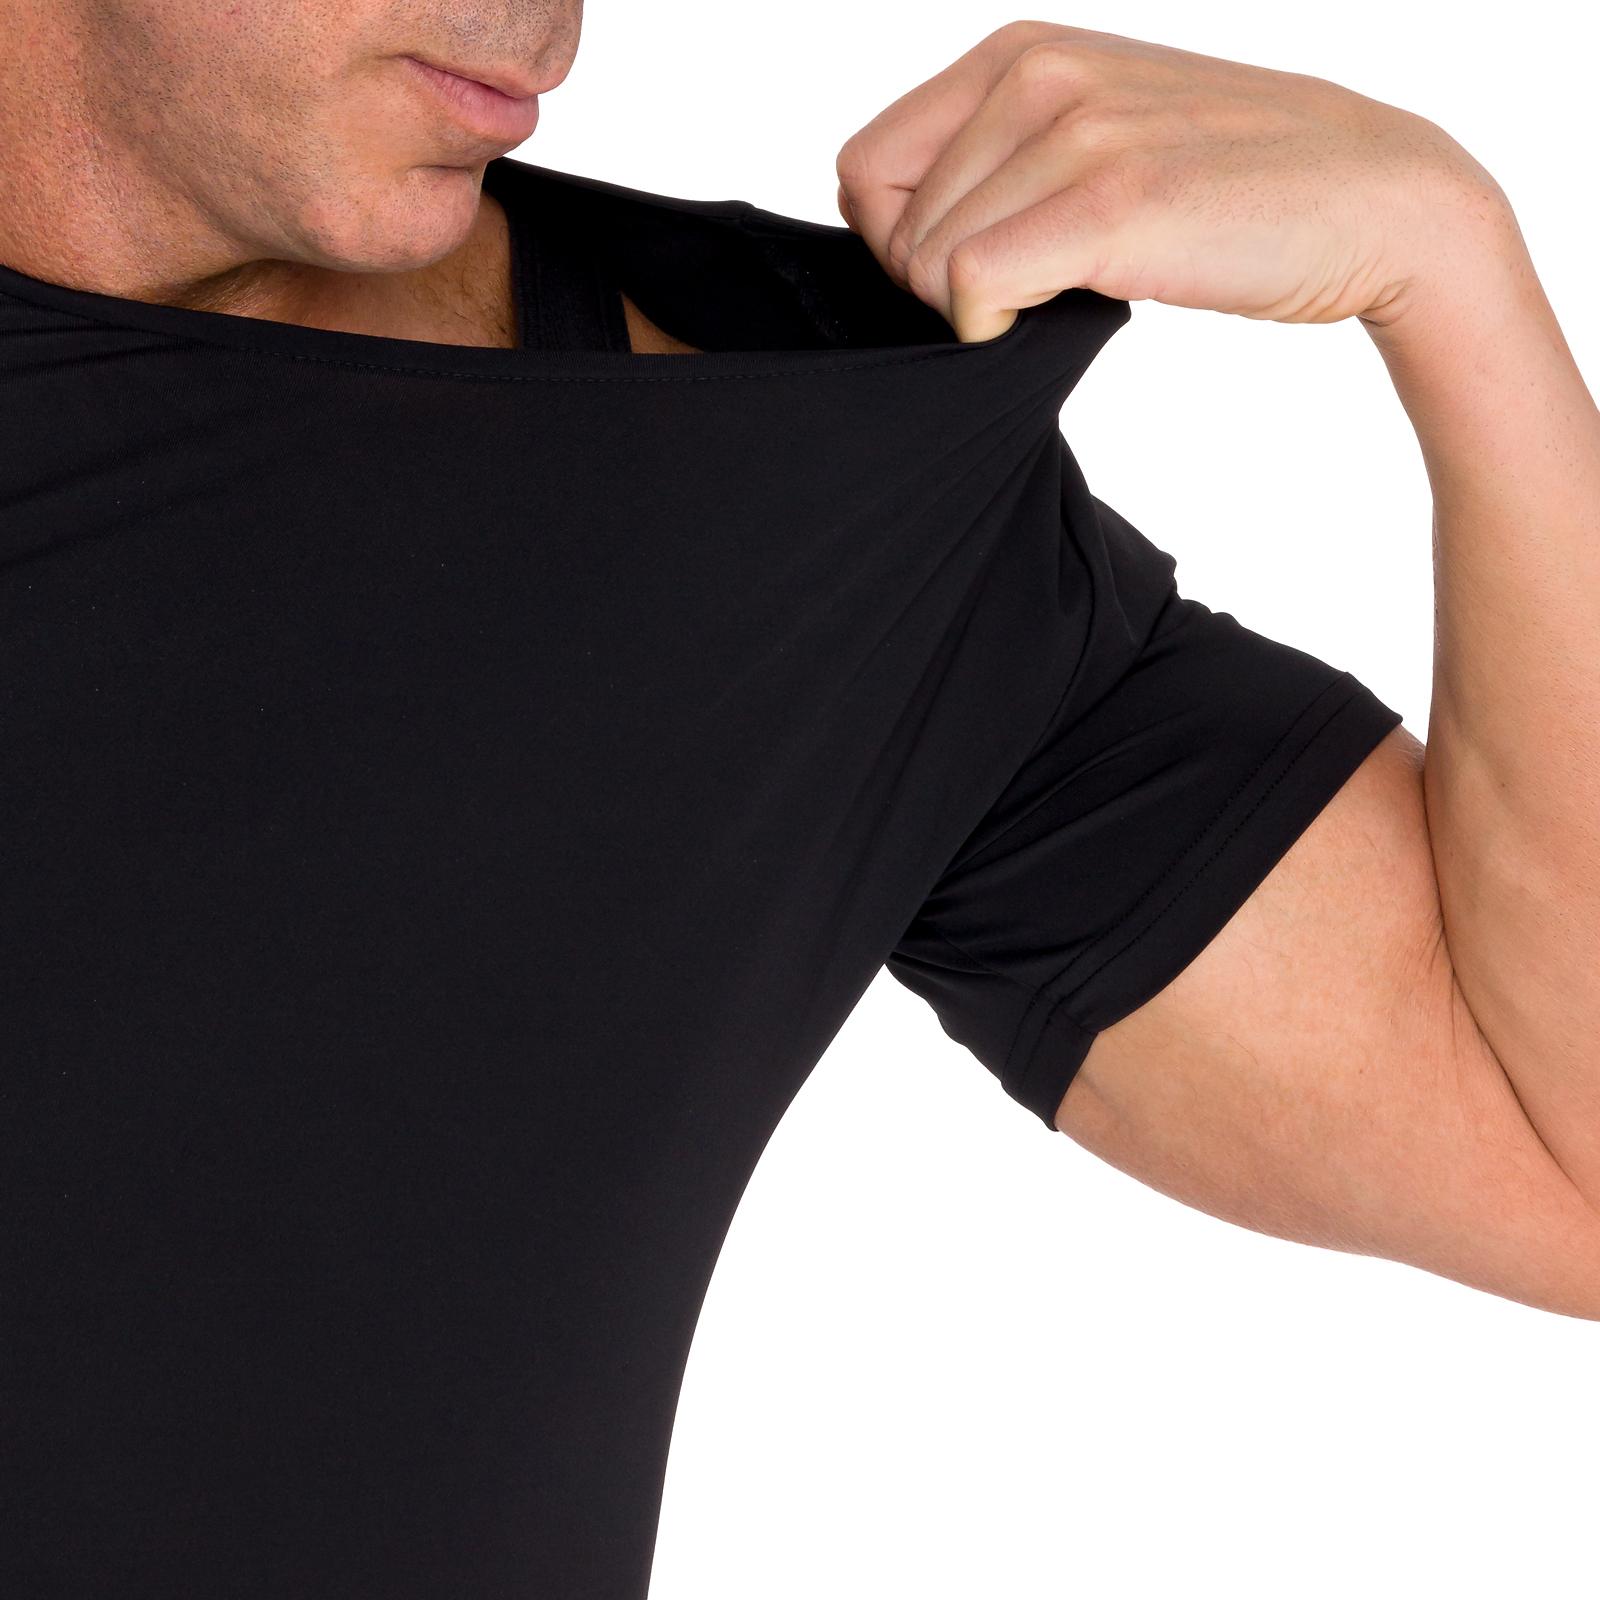 LISH-Men-039-s-Slimming-Compression-Body-Shaper-Gynecomastia-Undershirt thumbnail 11